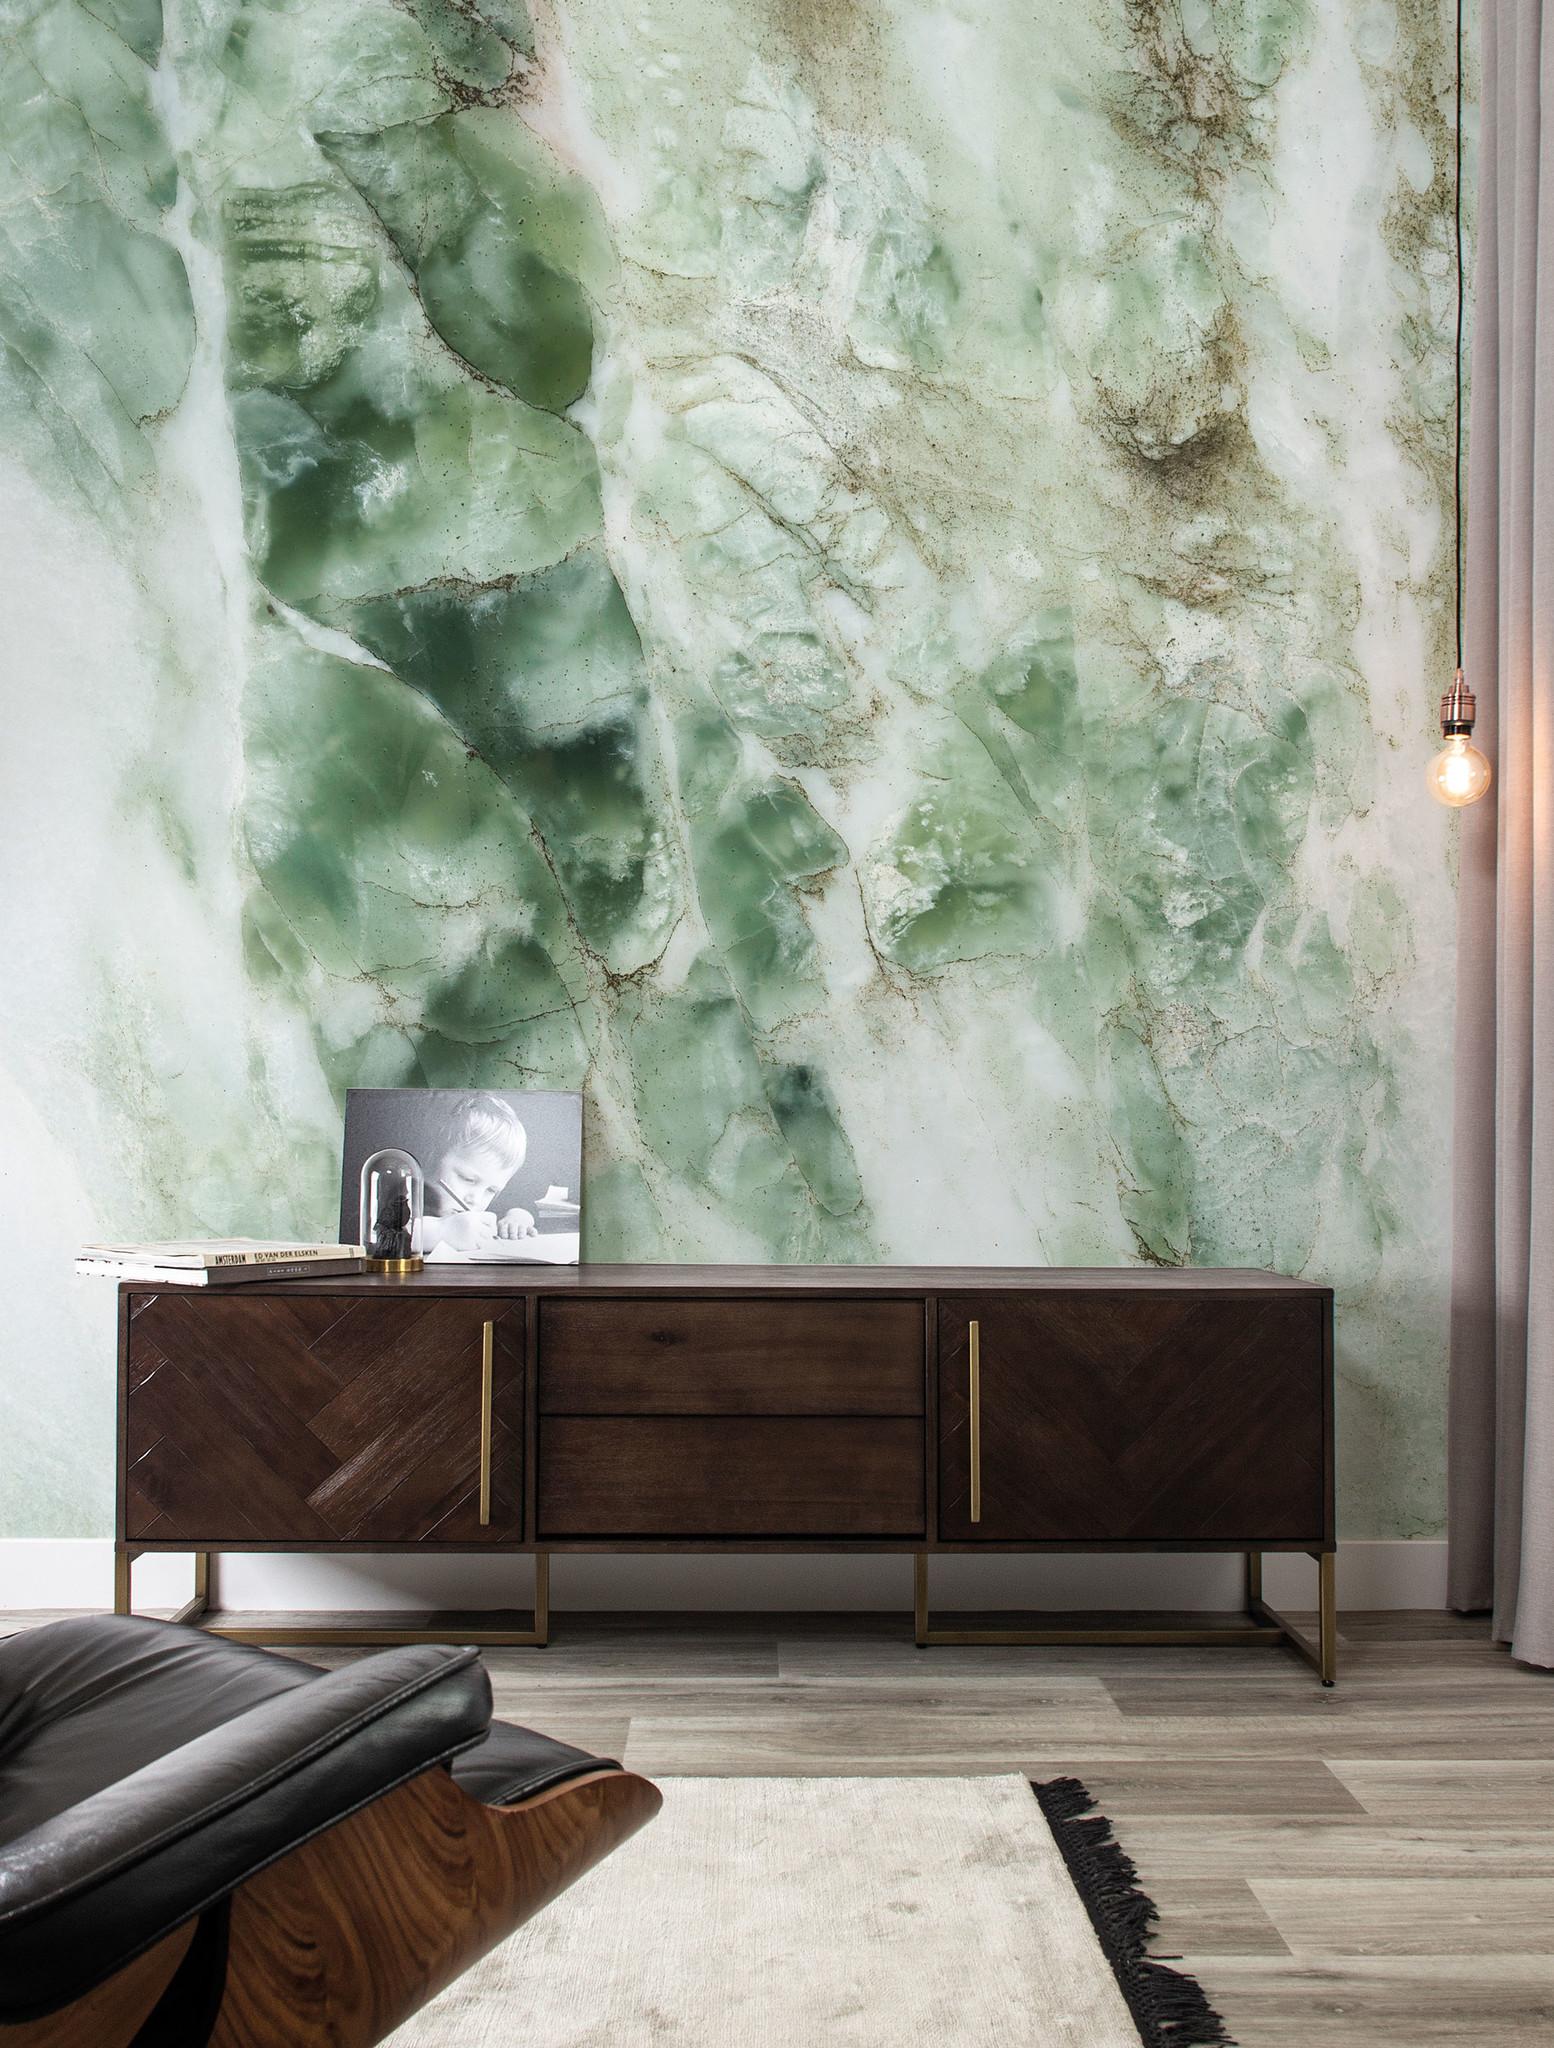 Wall Mural Marble Green 194 8 X 280 Cm Kek Amsterdam